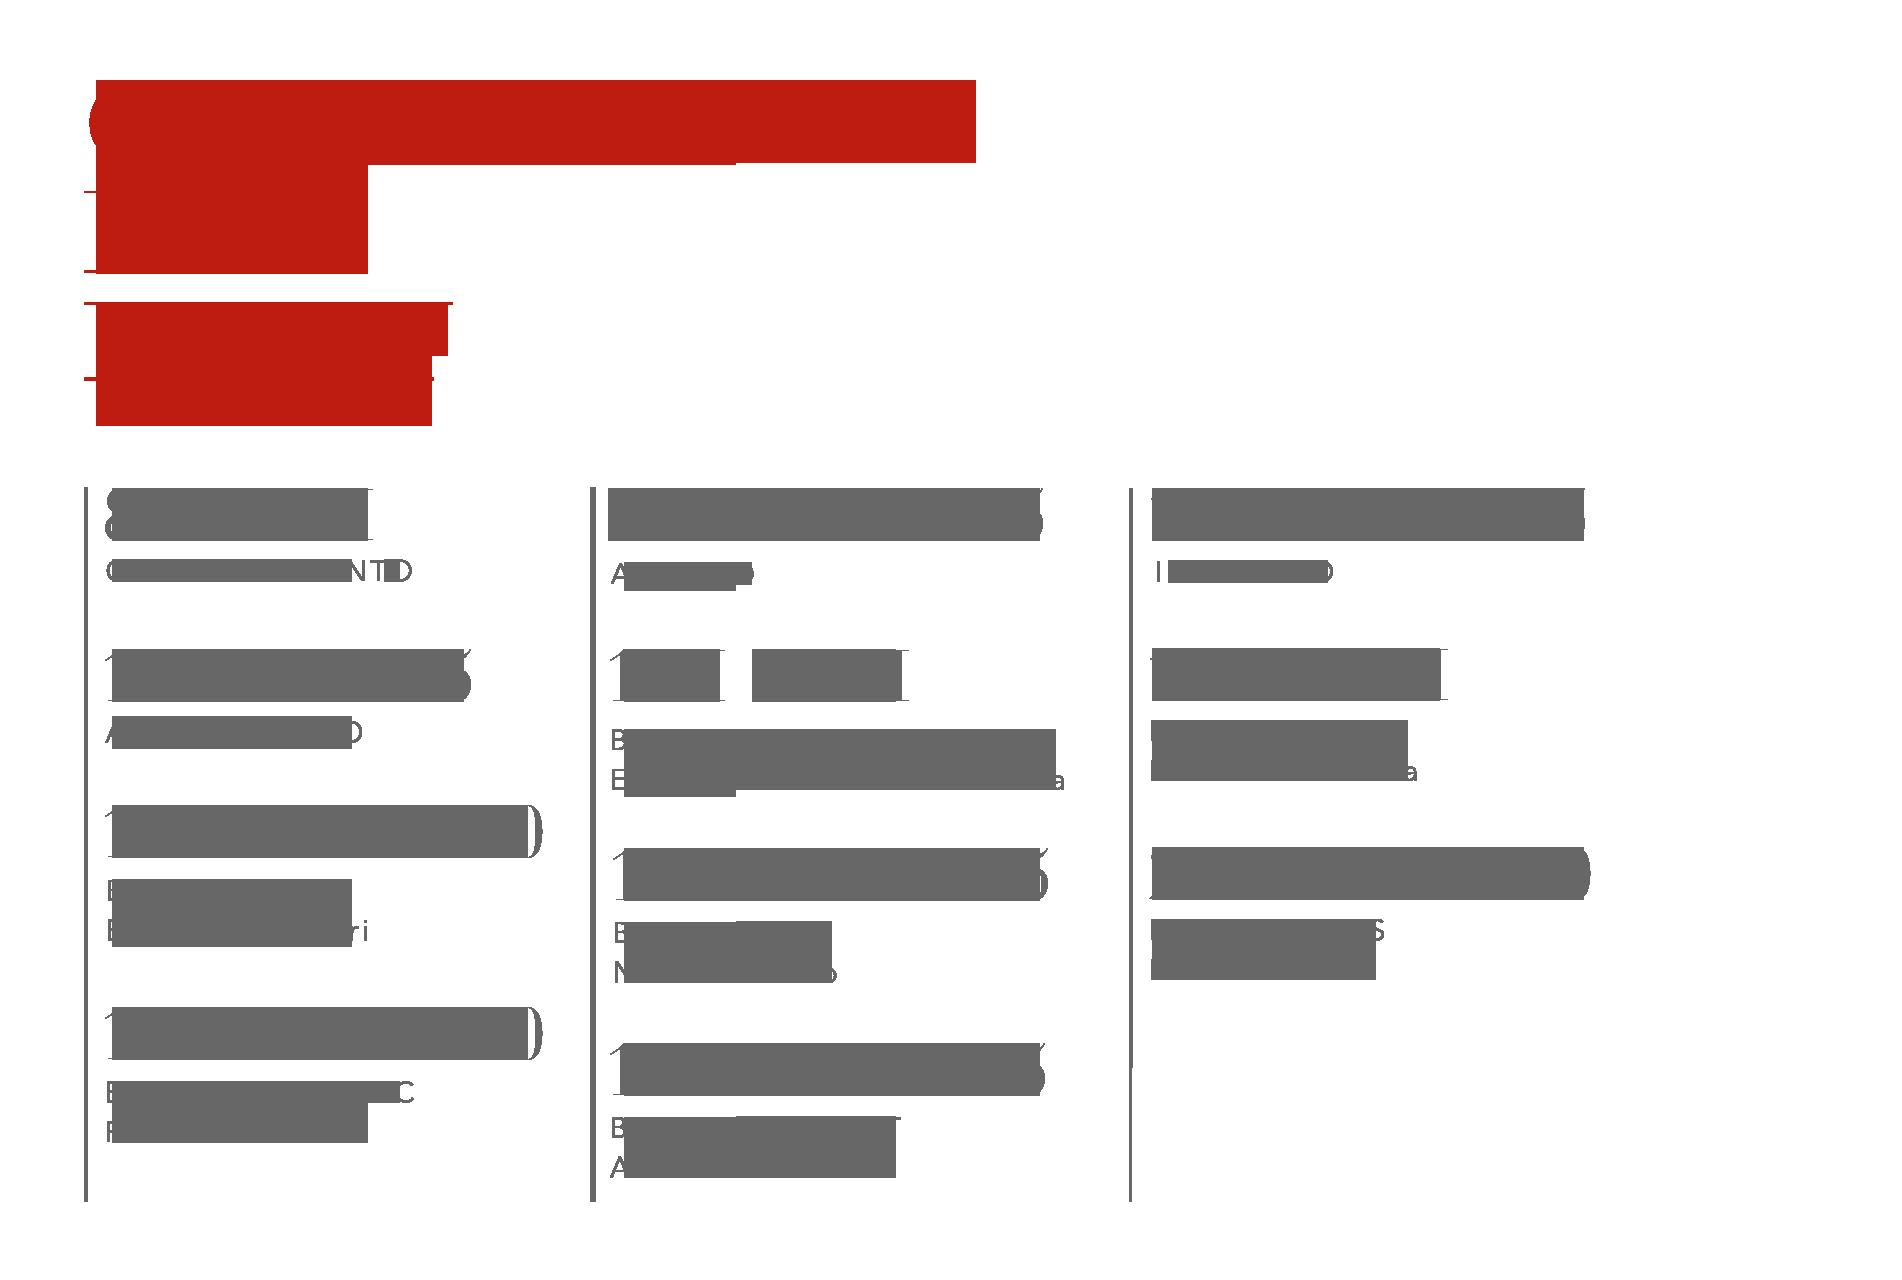 cronograma_site-2.png